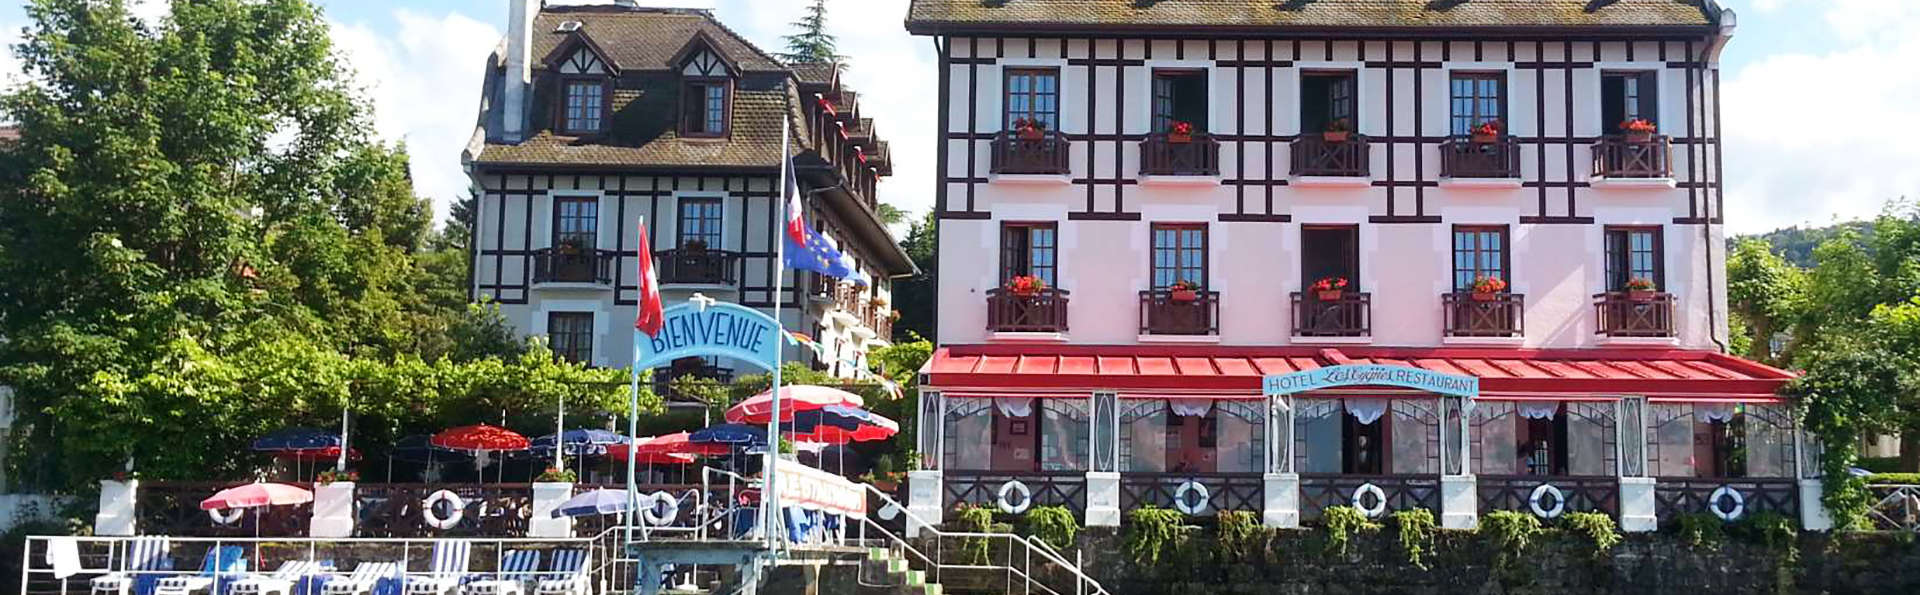 Hôtel Les Cygnes - EDIT_Fachada_2.jpg